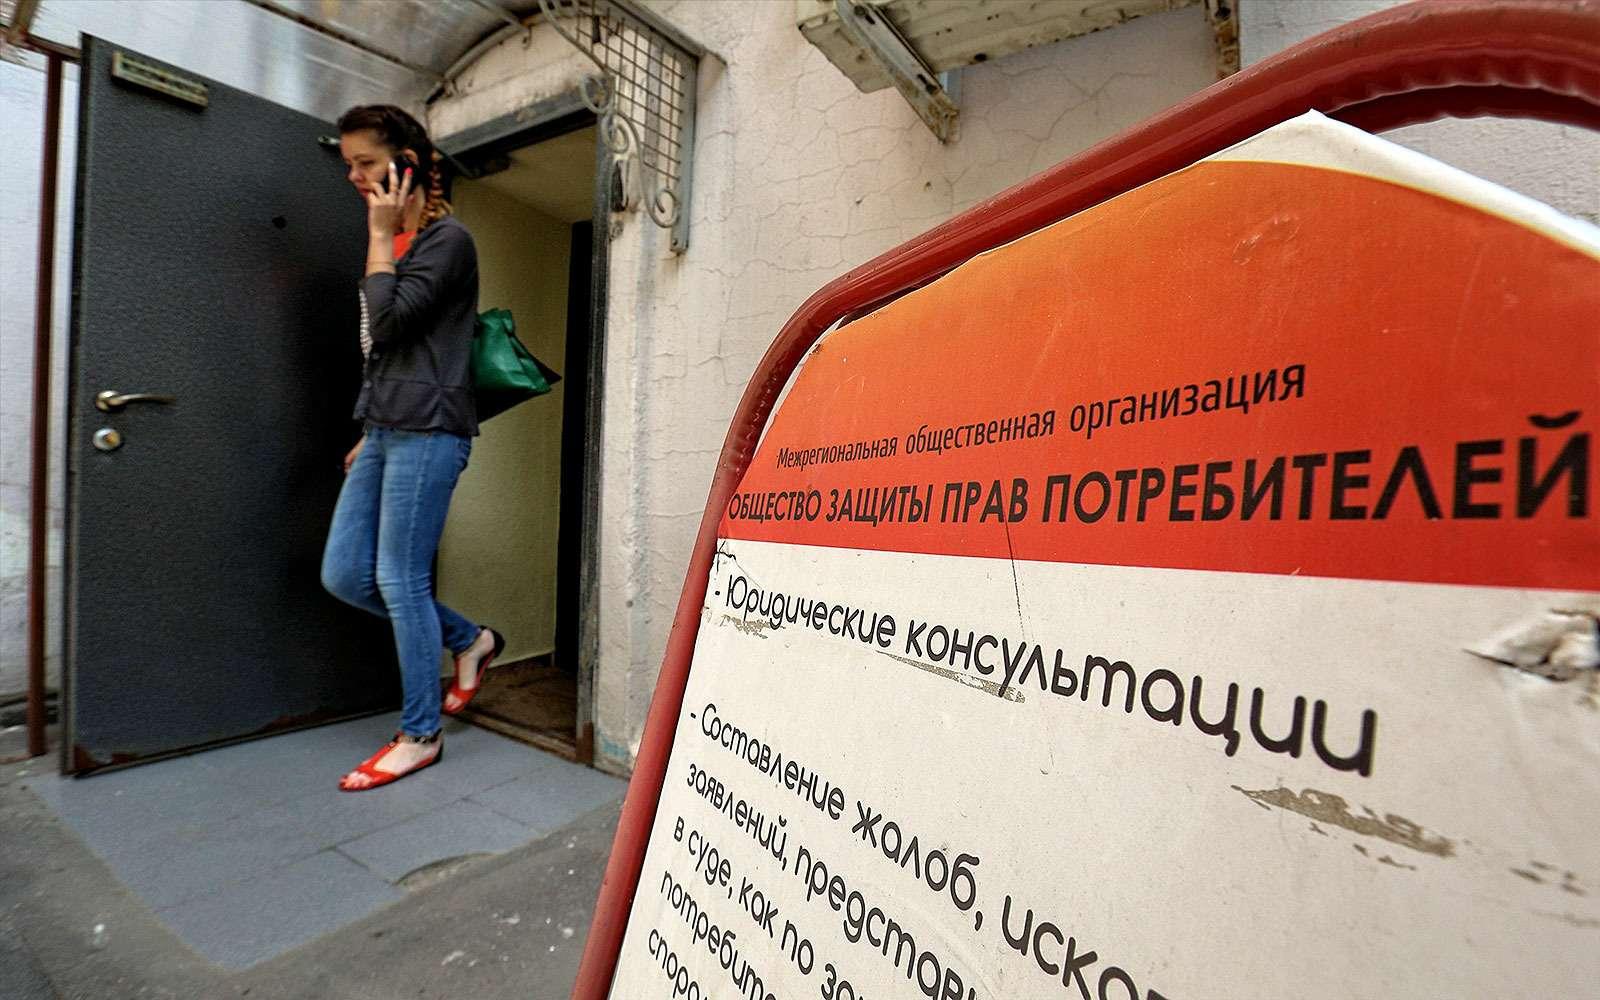 закон «Озащите прав потребителей»